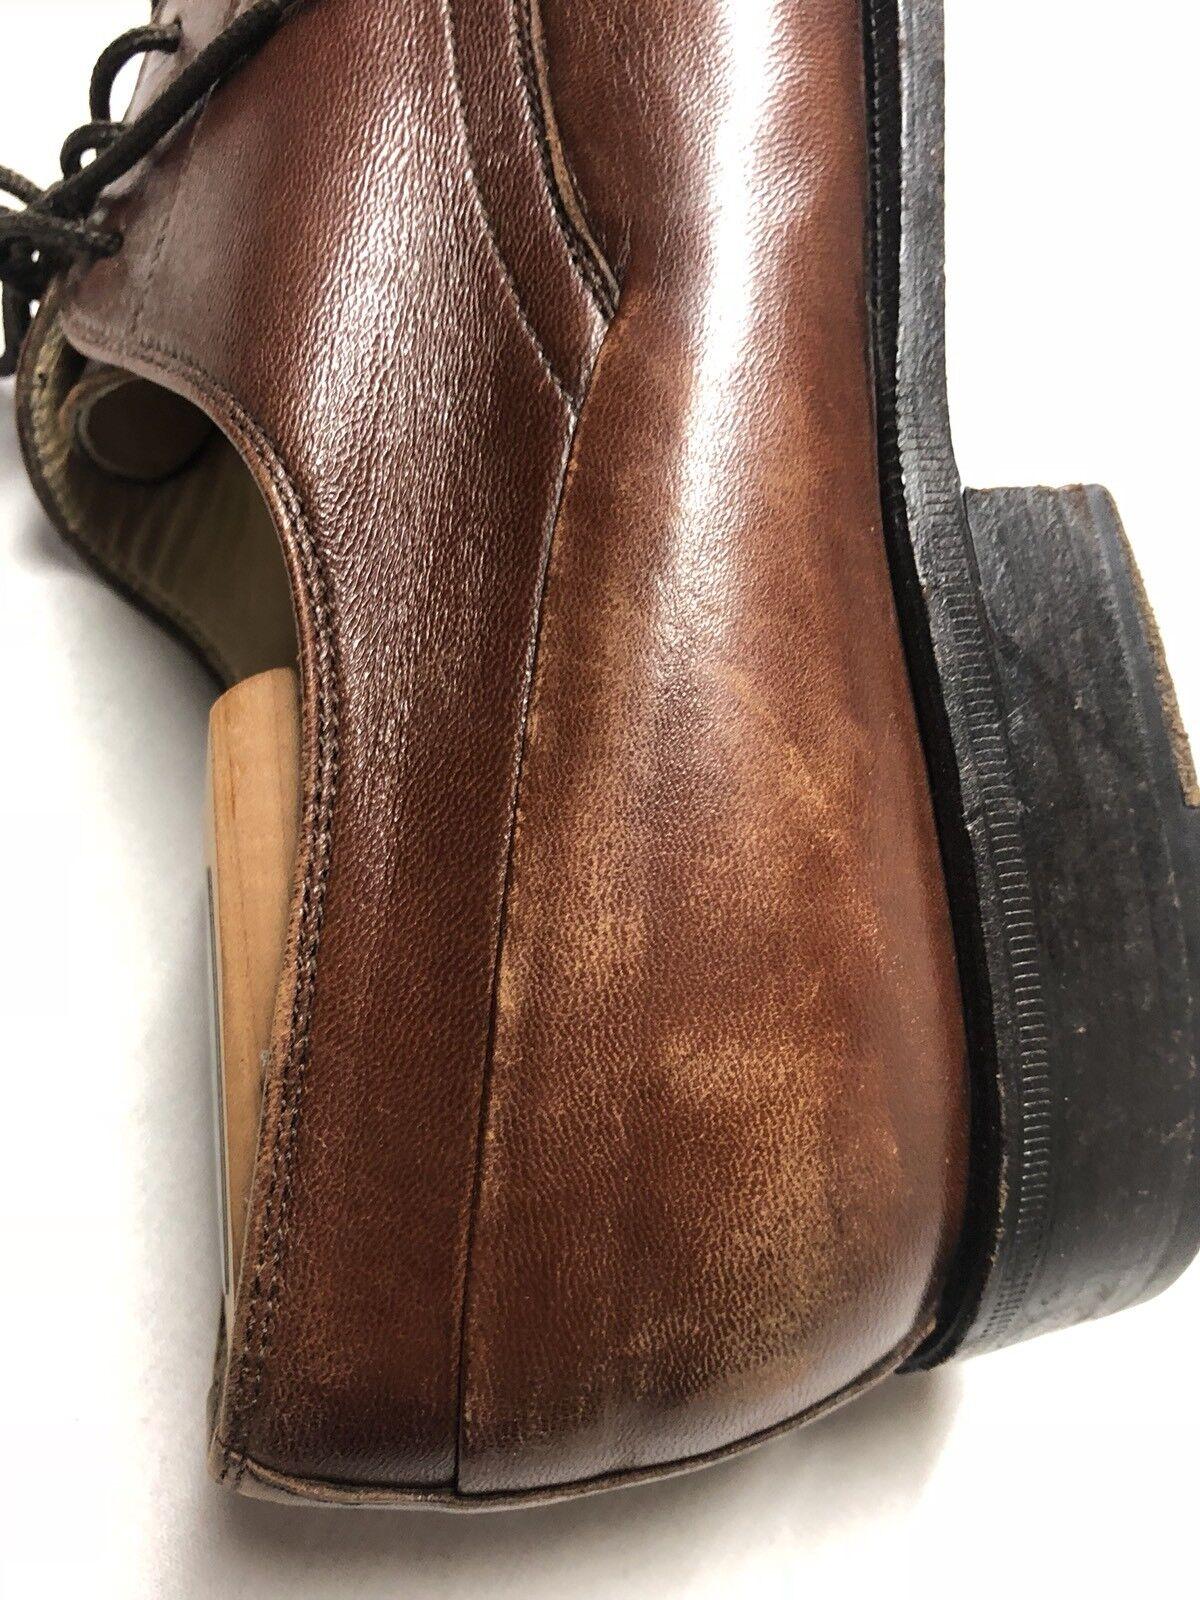 Bally   Herren Rogers Braun Leder Cap Toe Oxford Made Dress Schuhe Größe 11D Made Oxford in  67db59